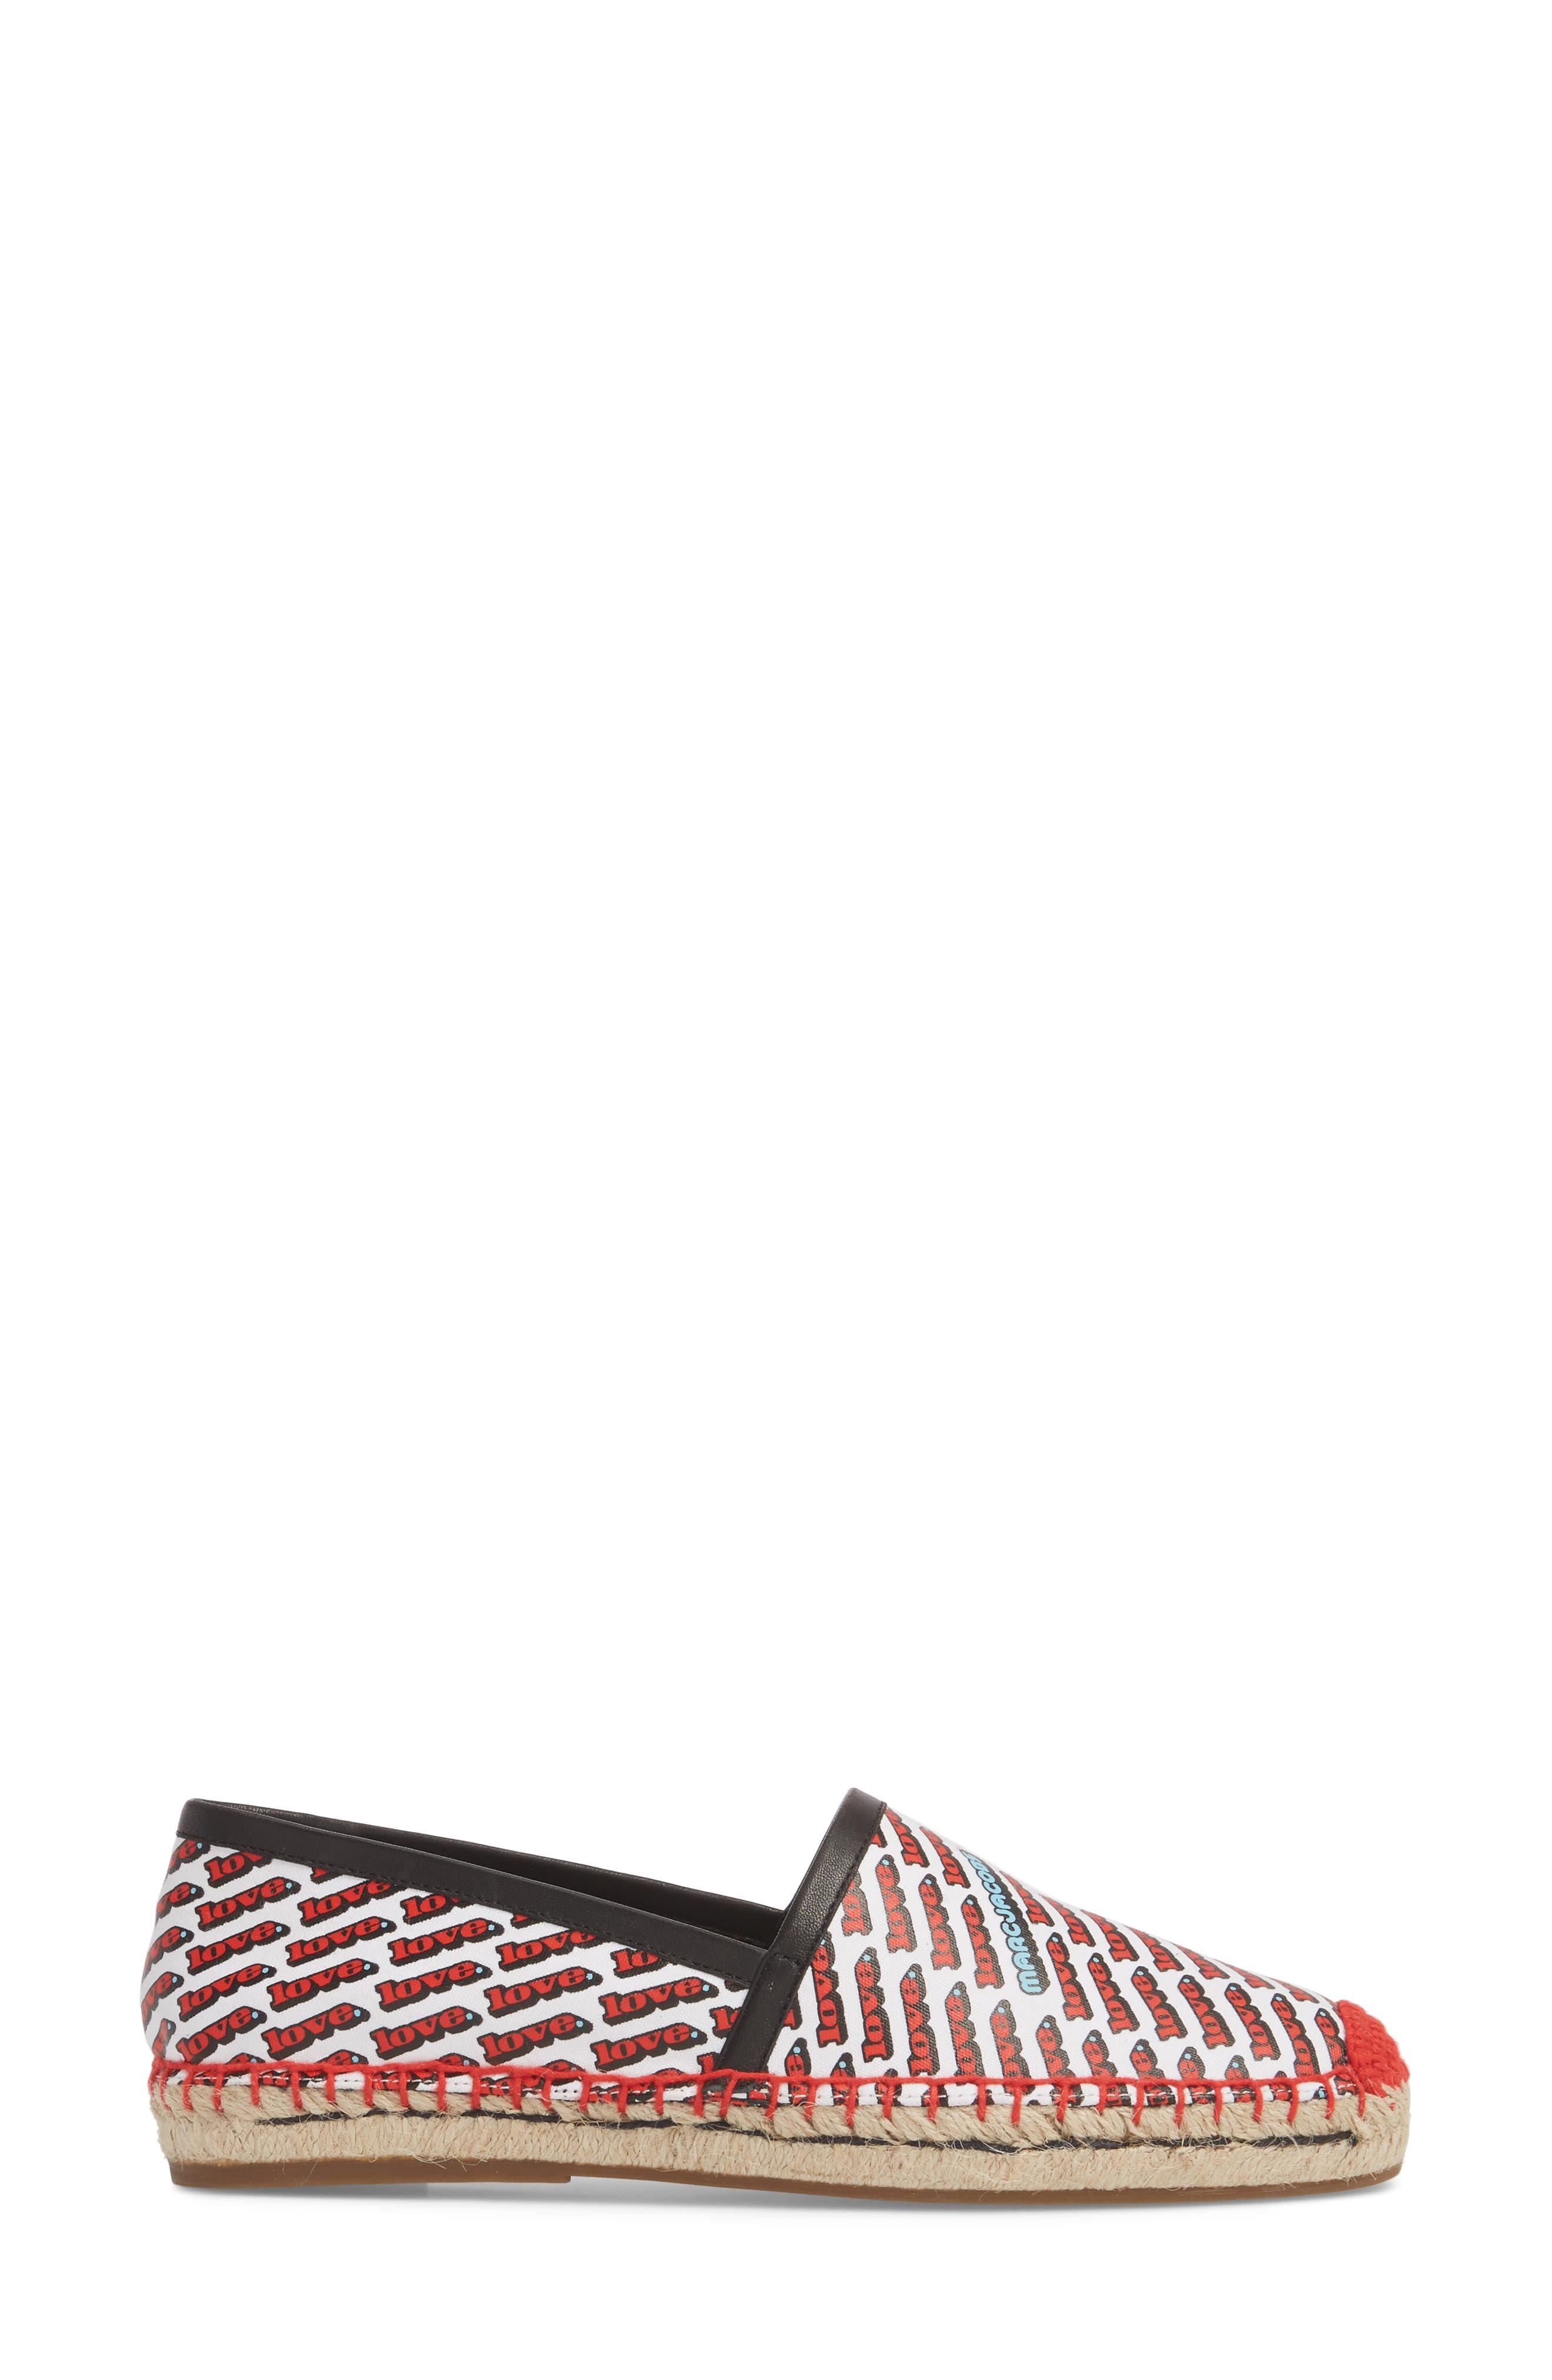 'Sienna' Espadrille Flat,                             Alternate thumbnail 3, color,                             101